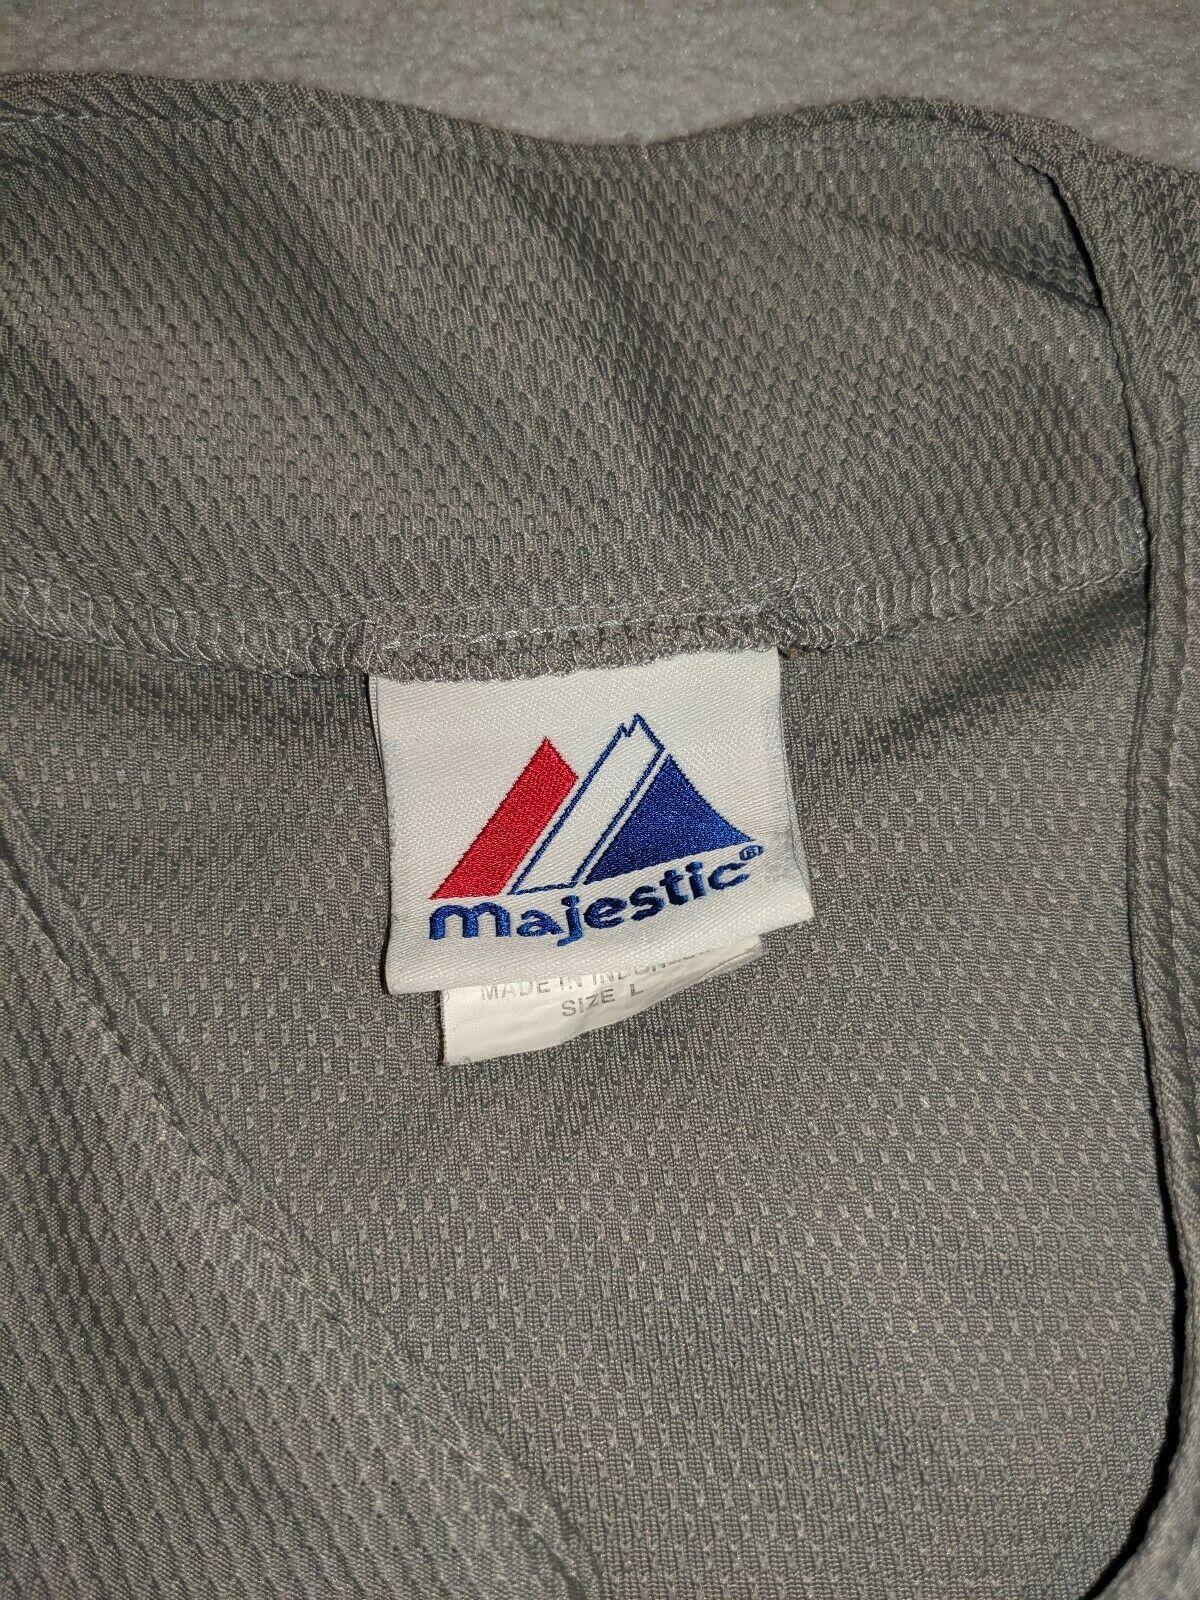 90s Majestic MLB New York NY Yankees Grey Baseball Jersey Blank size L VINTAGE